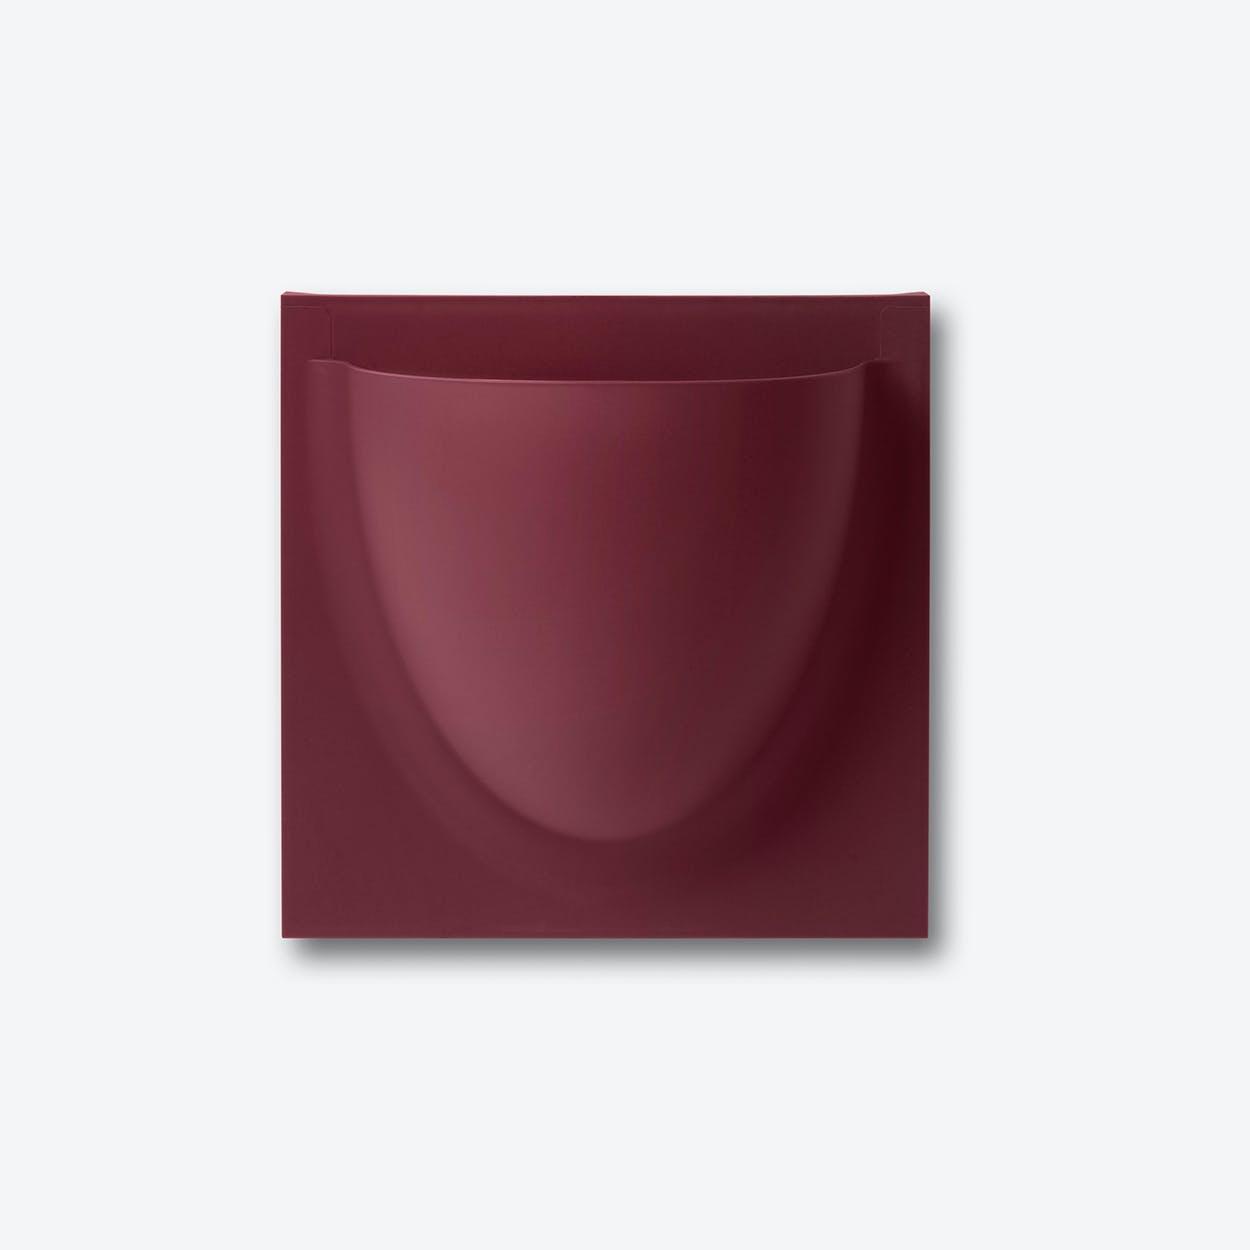 Wall Planter / Jar Mini in Bordeaux Violet (Set of 2)